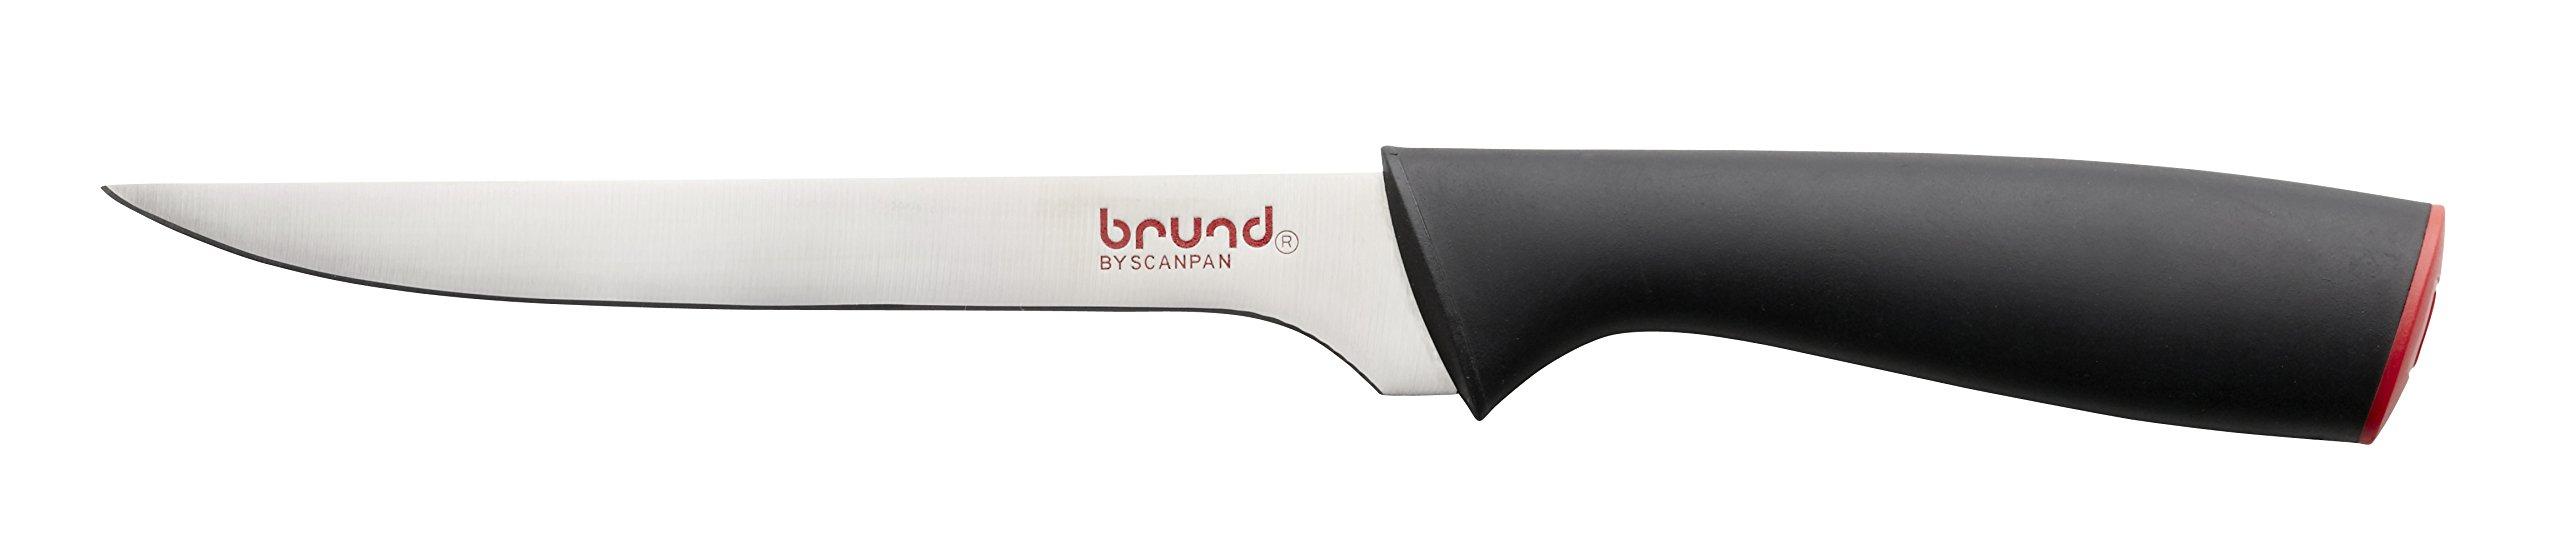 Brund By Scanpan 14051304 Brund EasyCut 6,75''/17cmFilleting Tomato Knife, 6.75'', Black by Brund By Scanpan